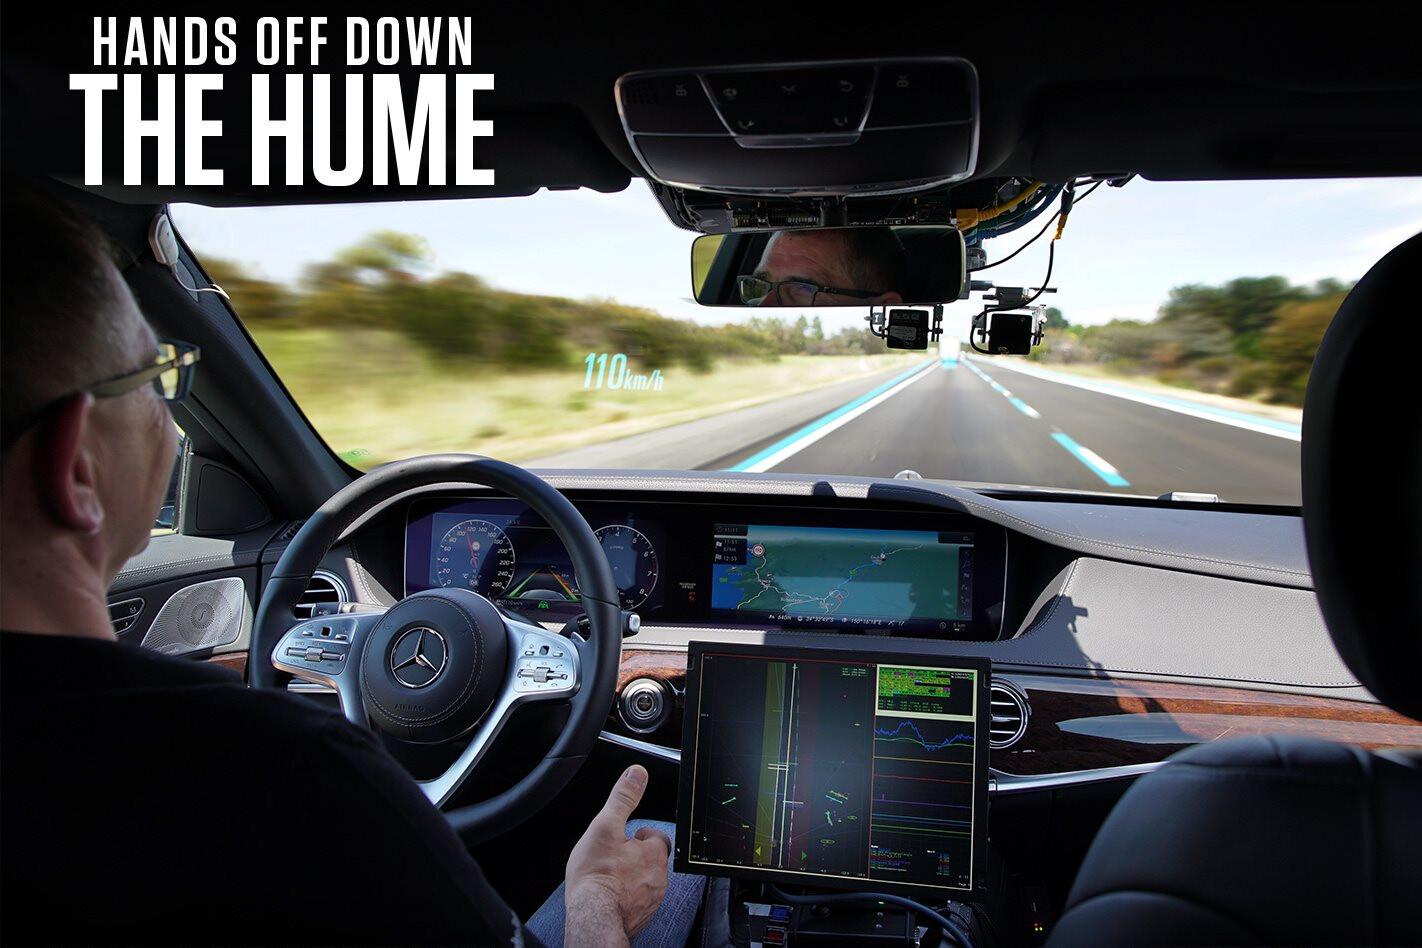 We ride shotgun in an autonomous Mercedes S-class